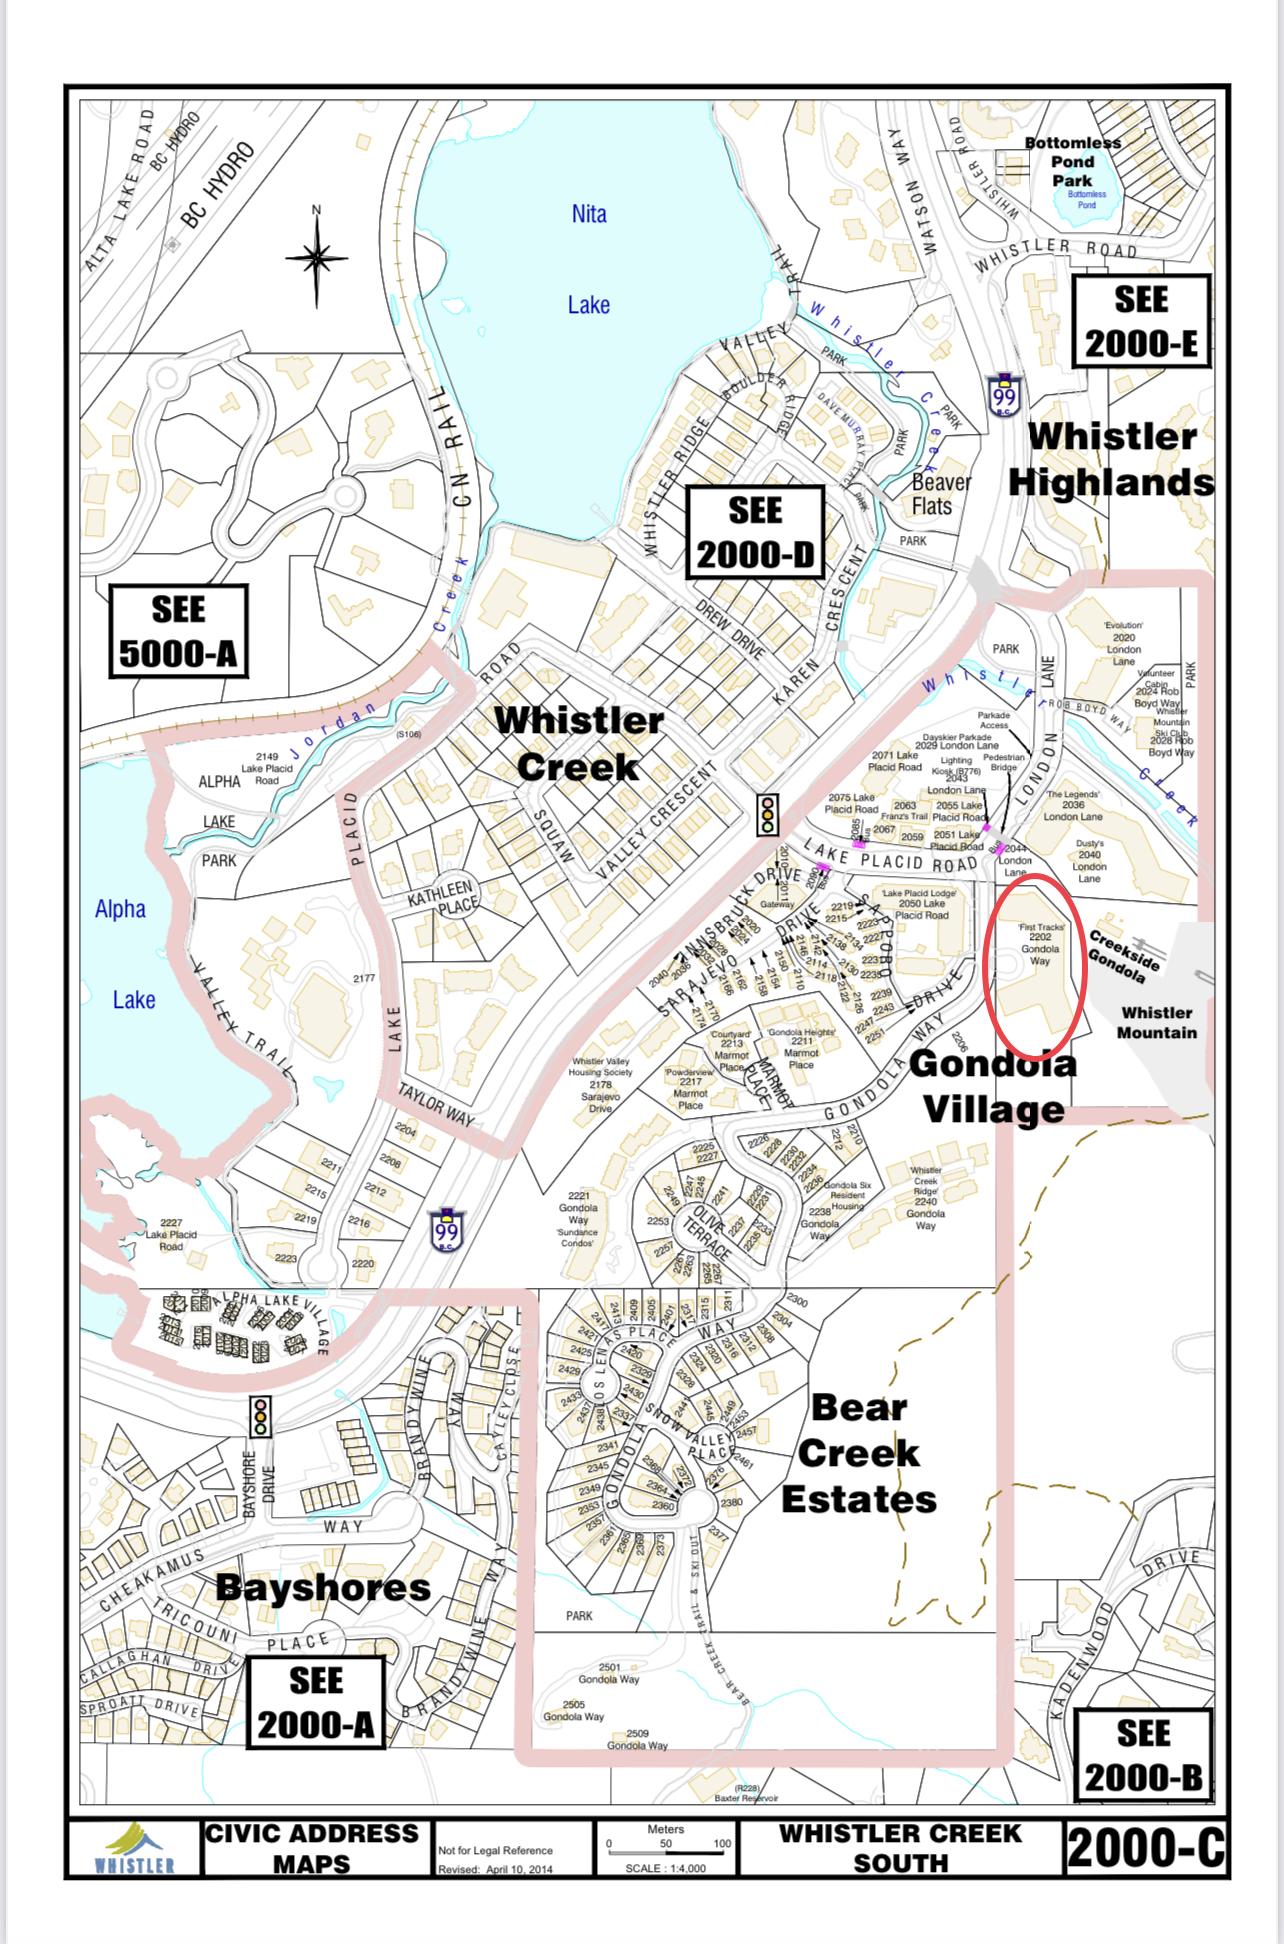 First Tracks Lodge Civic address map